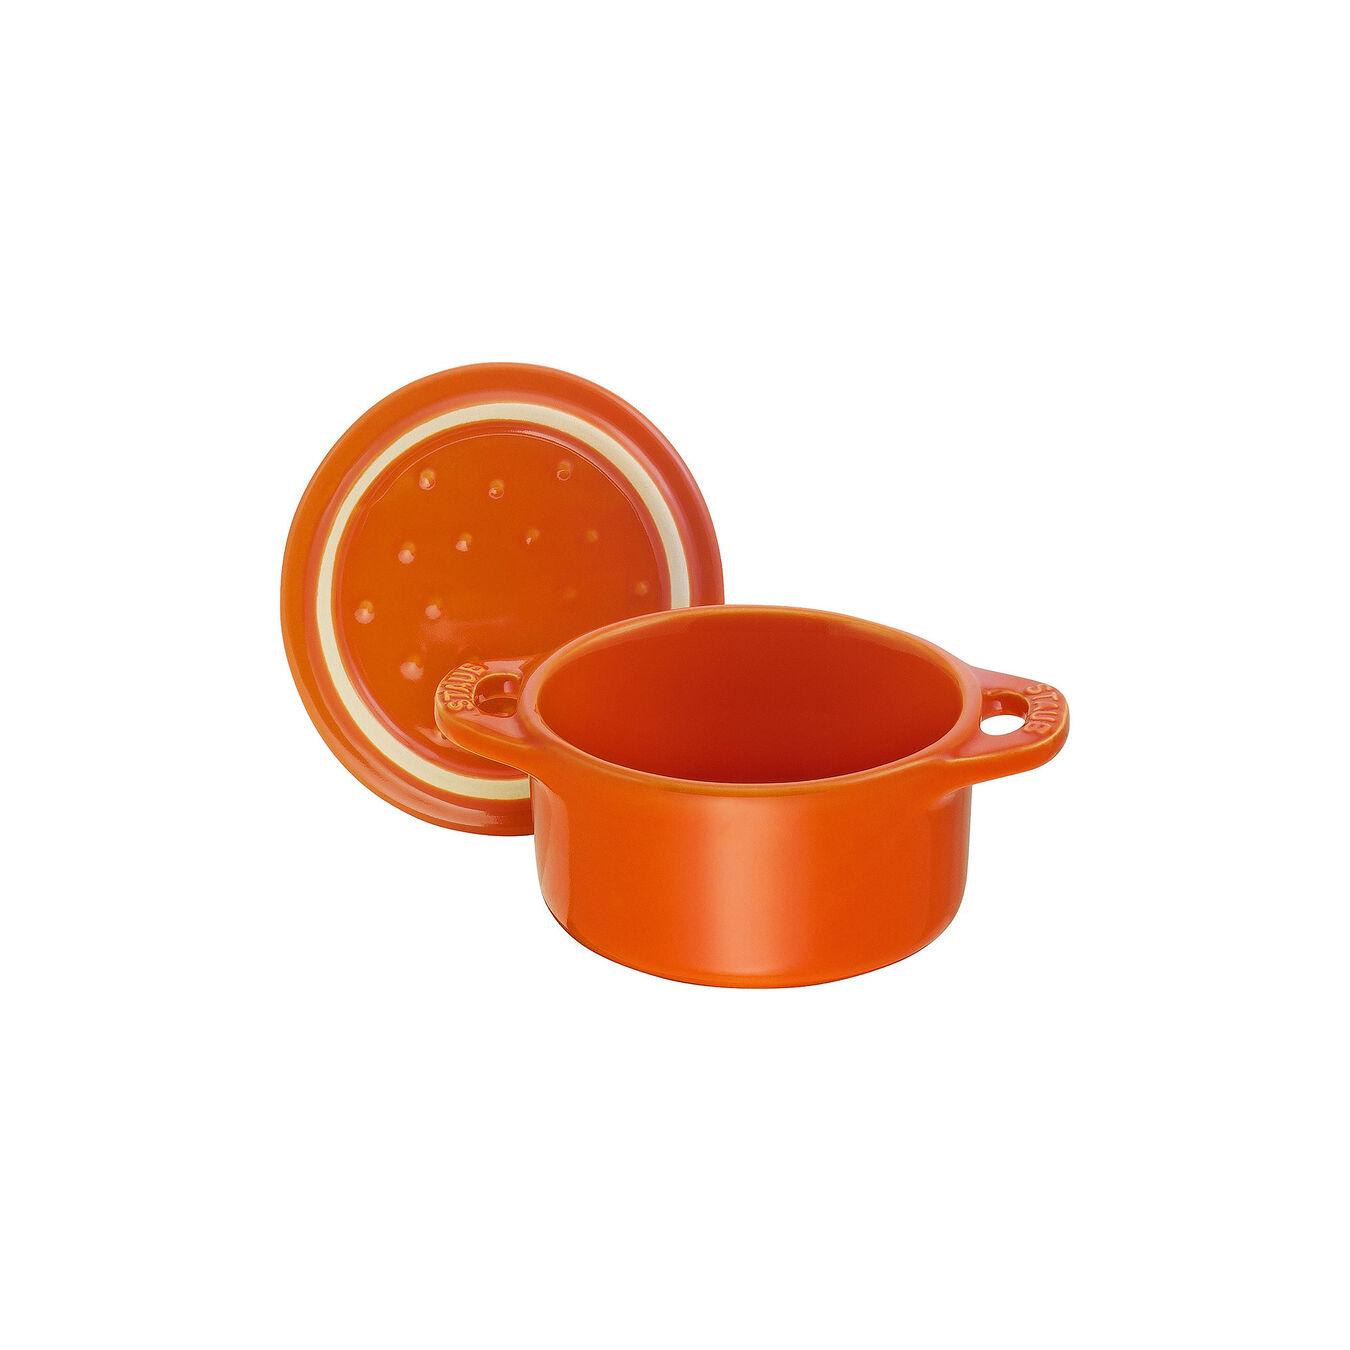 Mini cocotte rotonda - 10 cm, arancione,,large 6